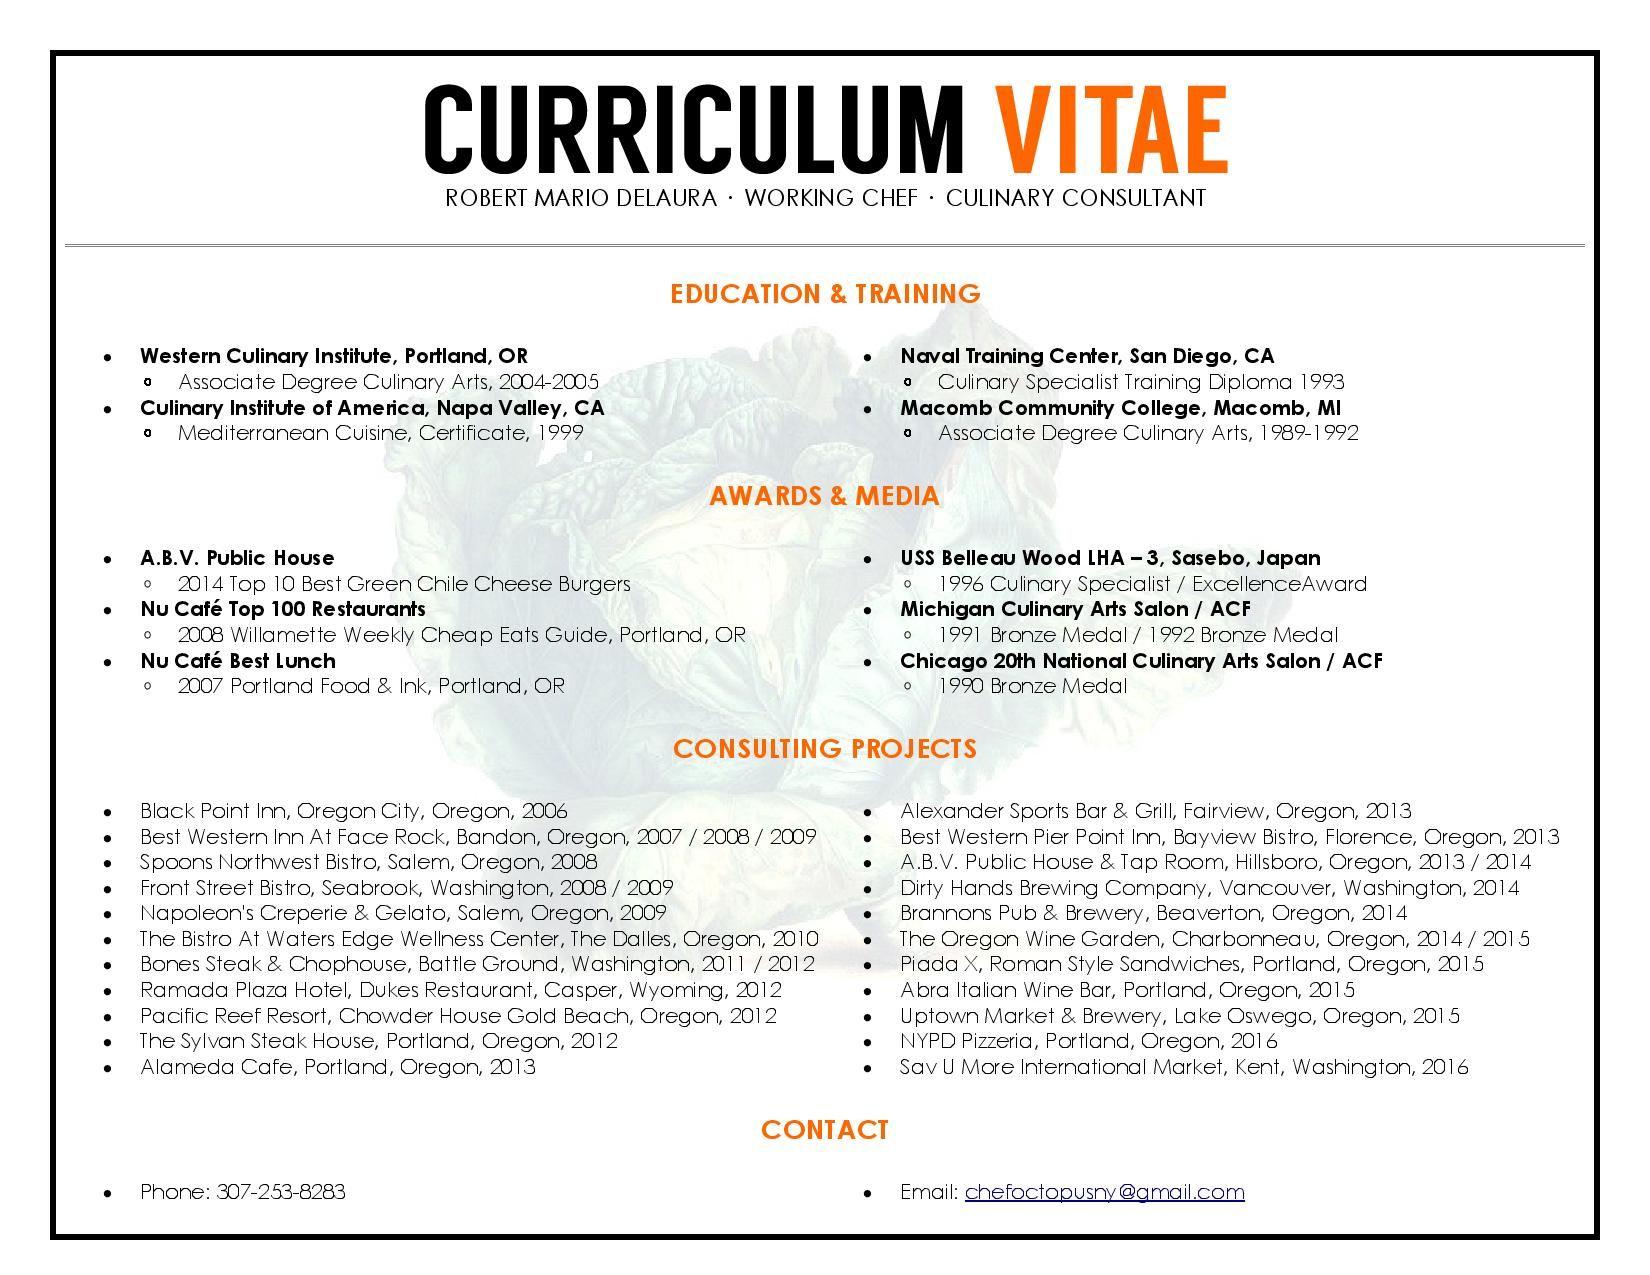 unique cv resume design to resemble a restaurant menu format unique cv resume design to resemble a restaurant menu format